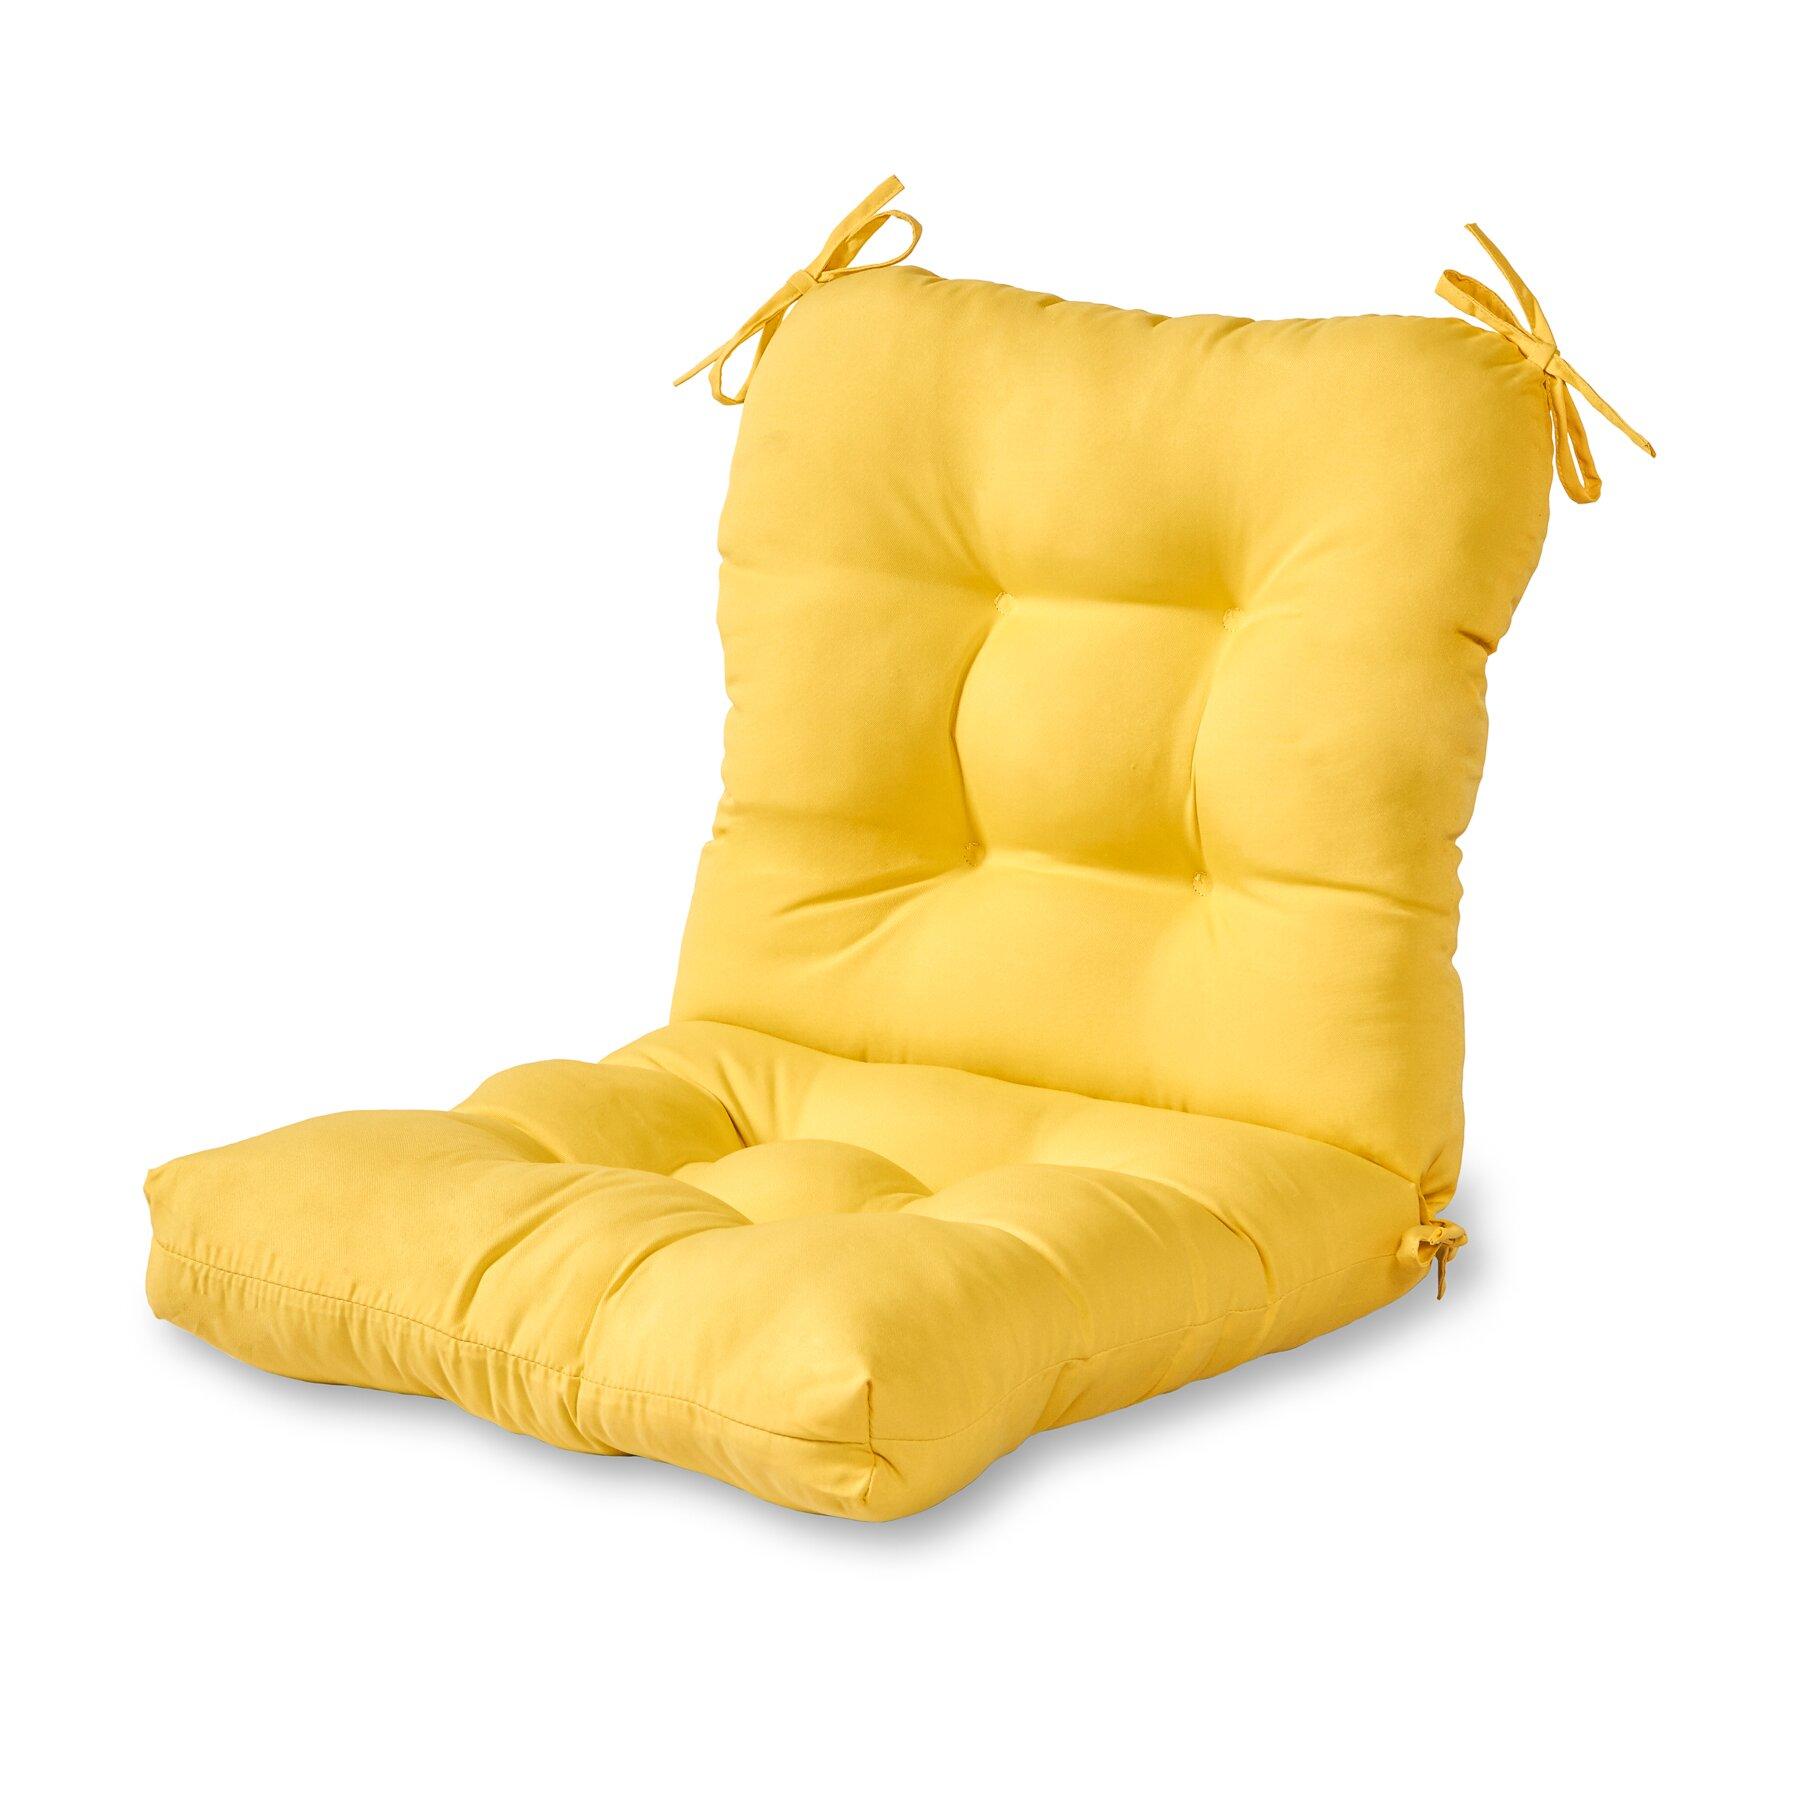 Outdoor Lounge Chair Cushion Wayfair